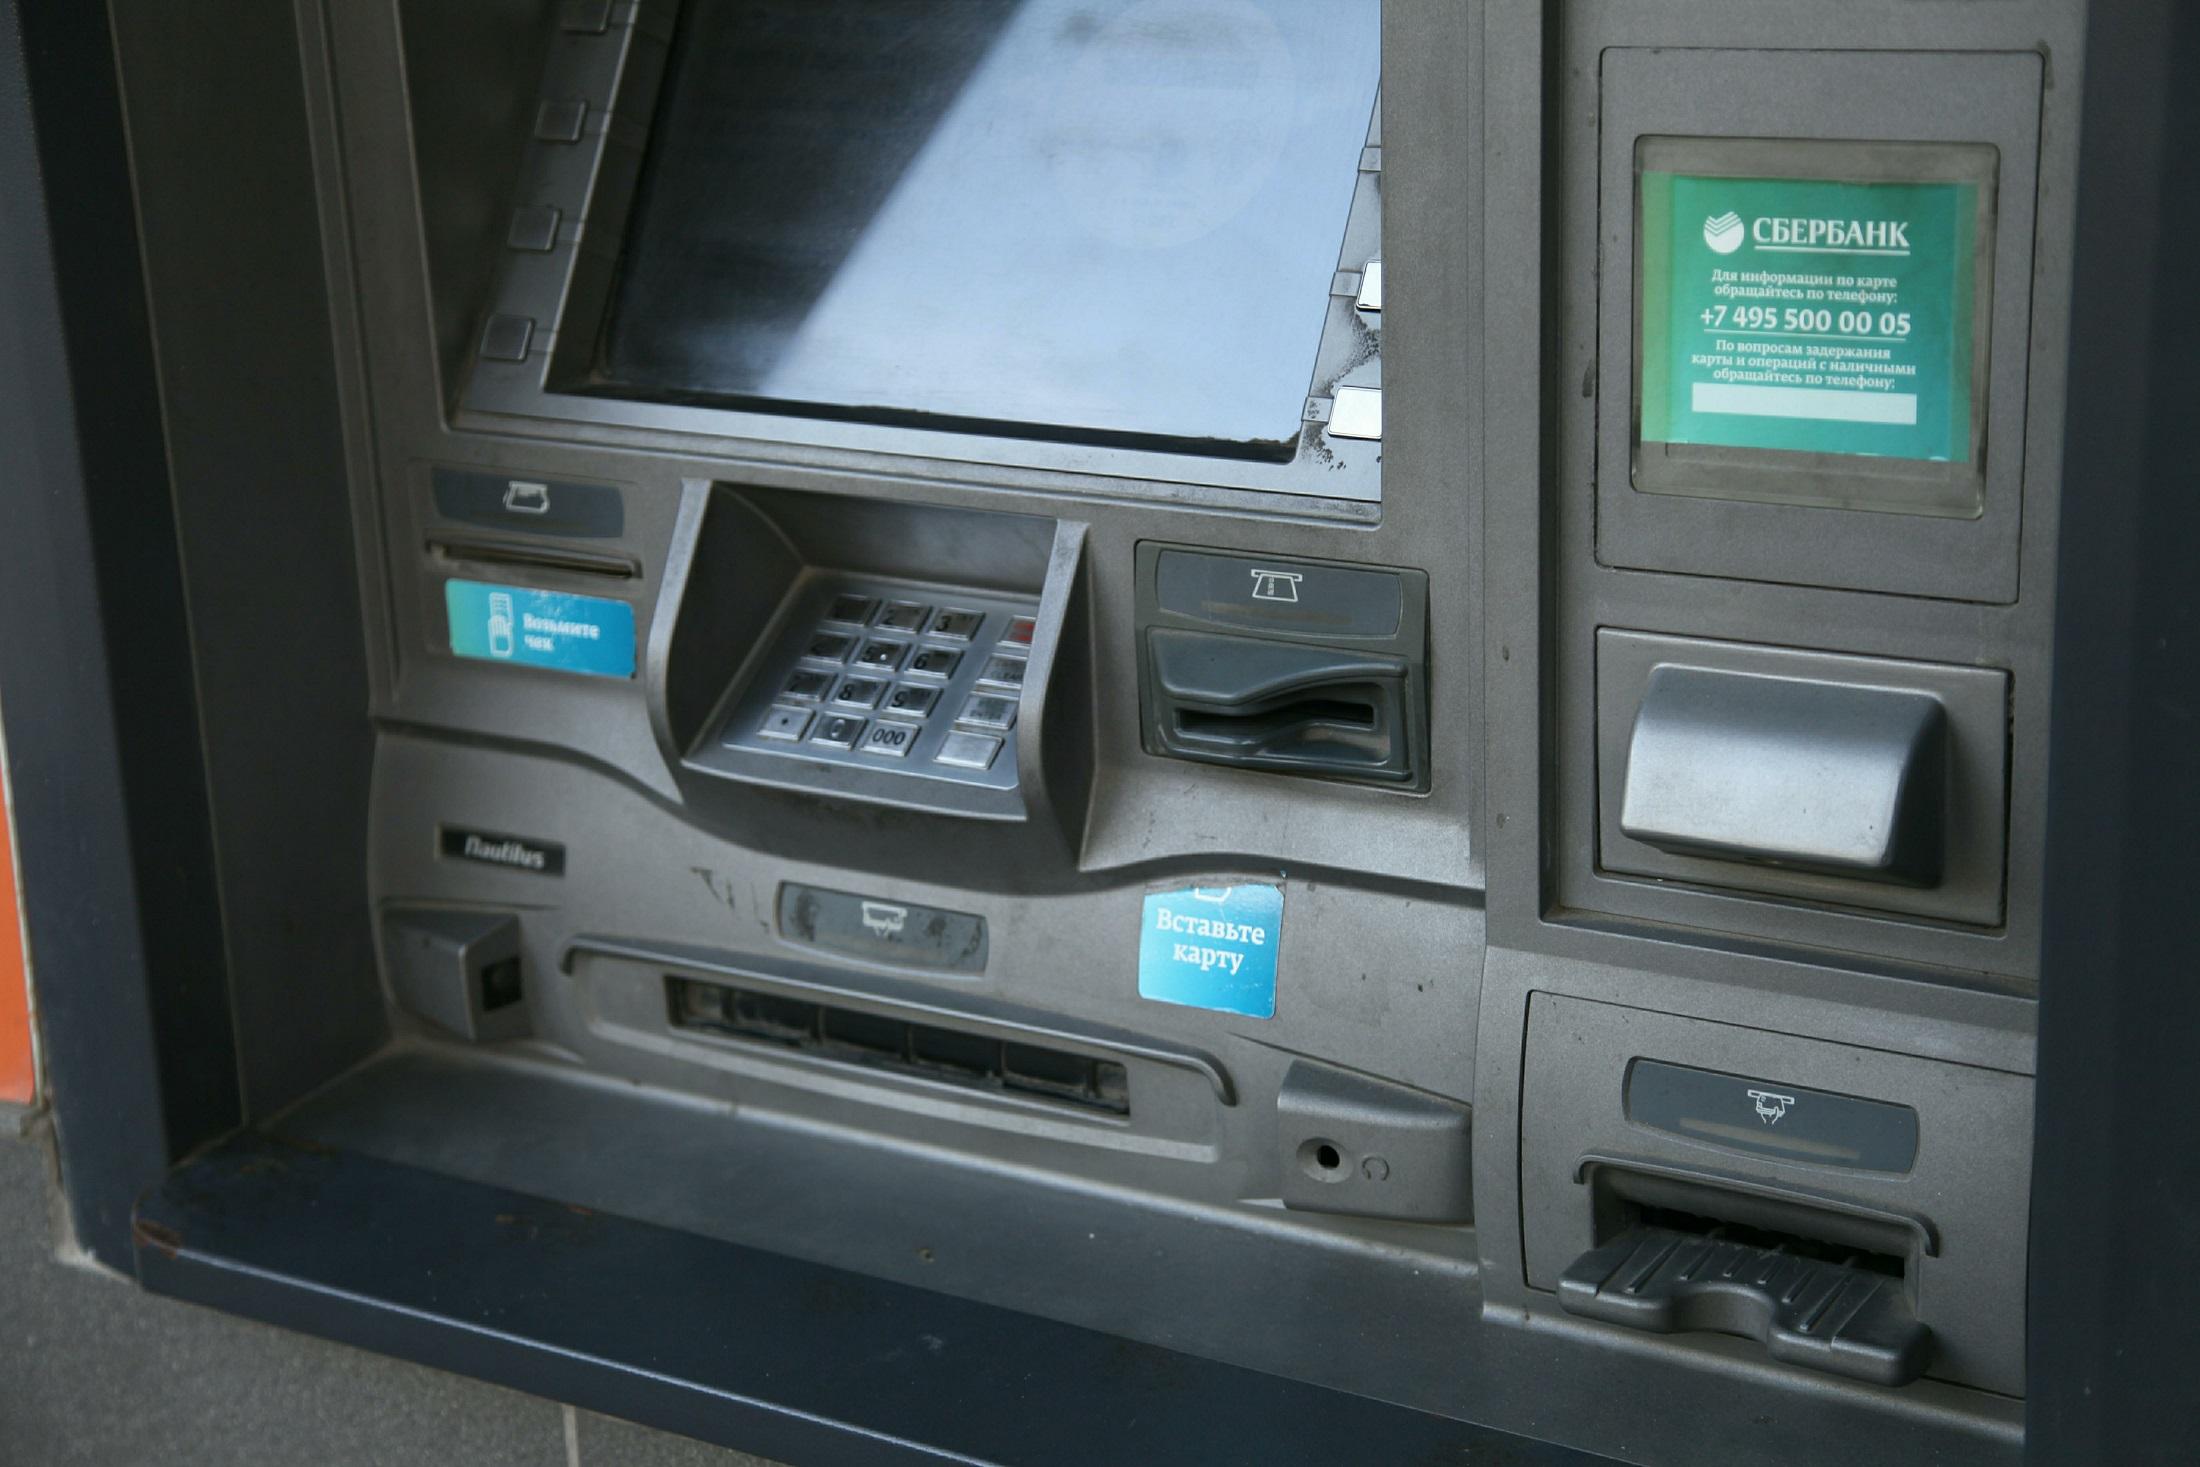 Под Волгоградом 30-летний мужчина расстрелял банкомат из-за сбоя